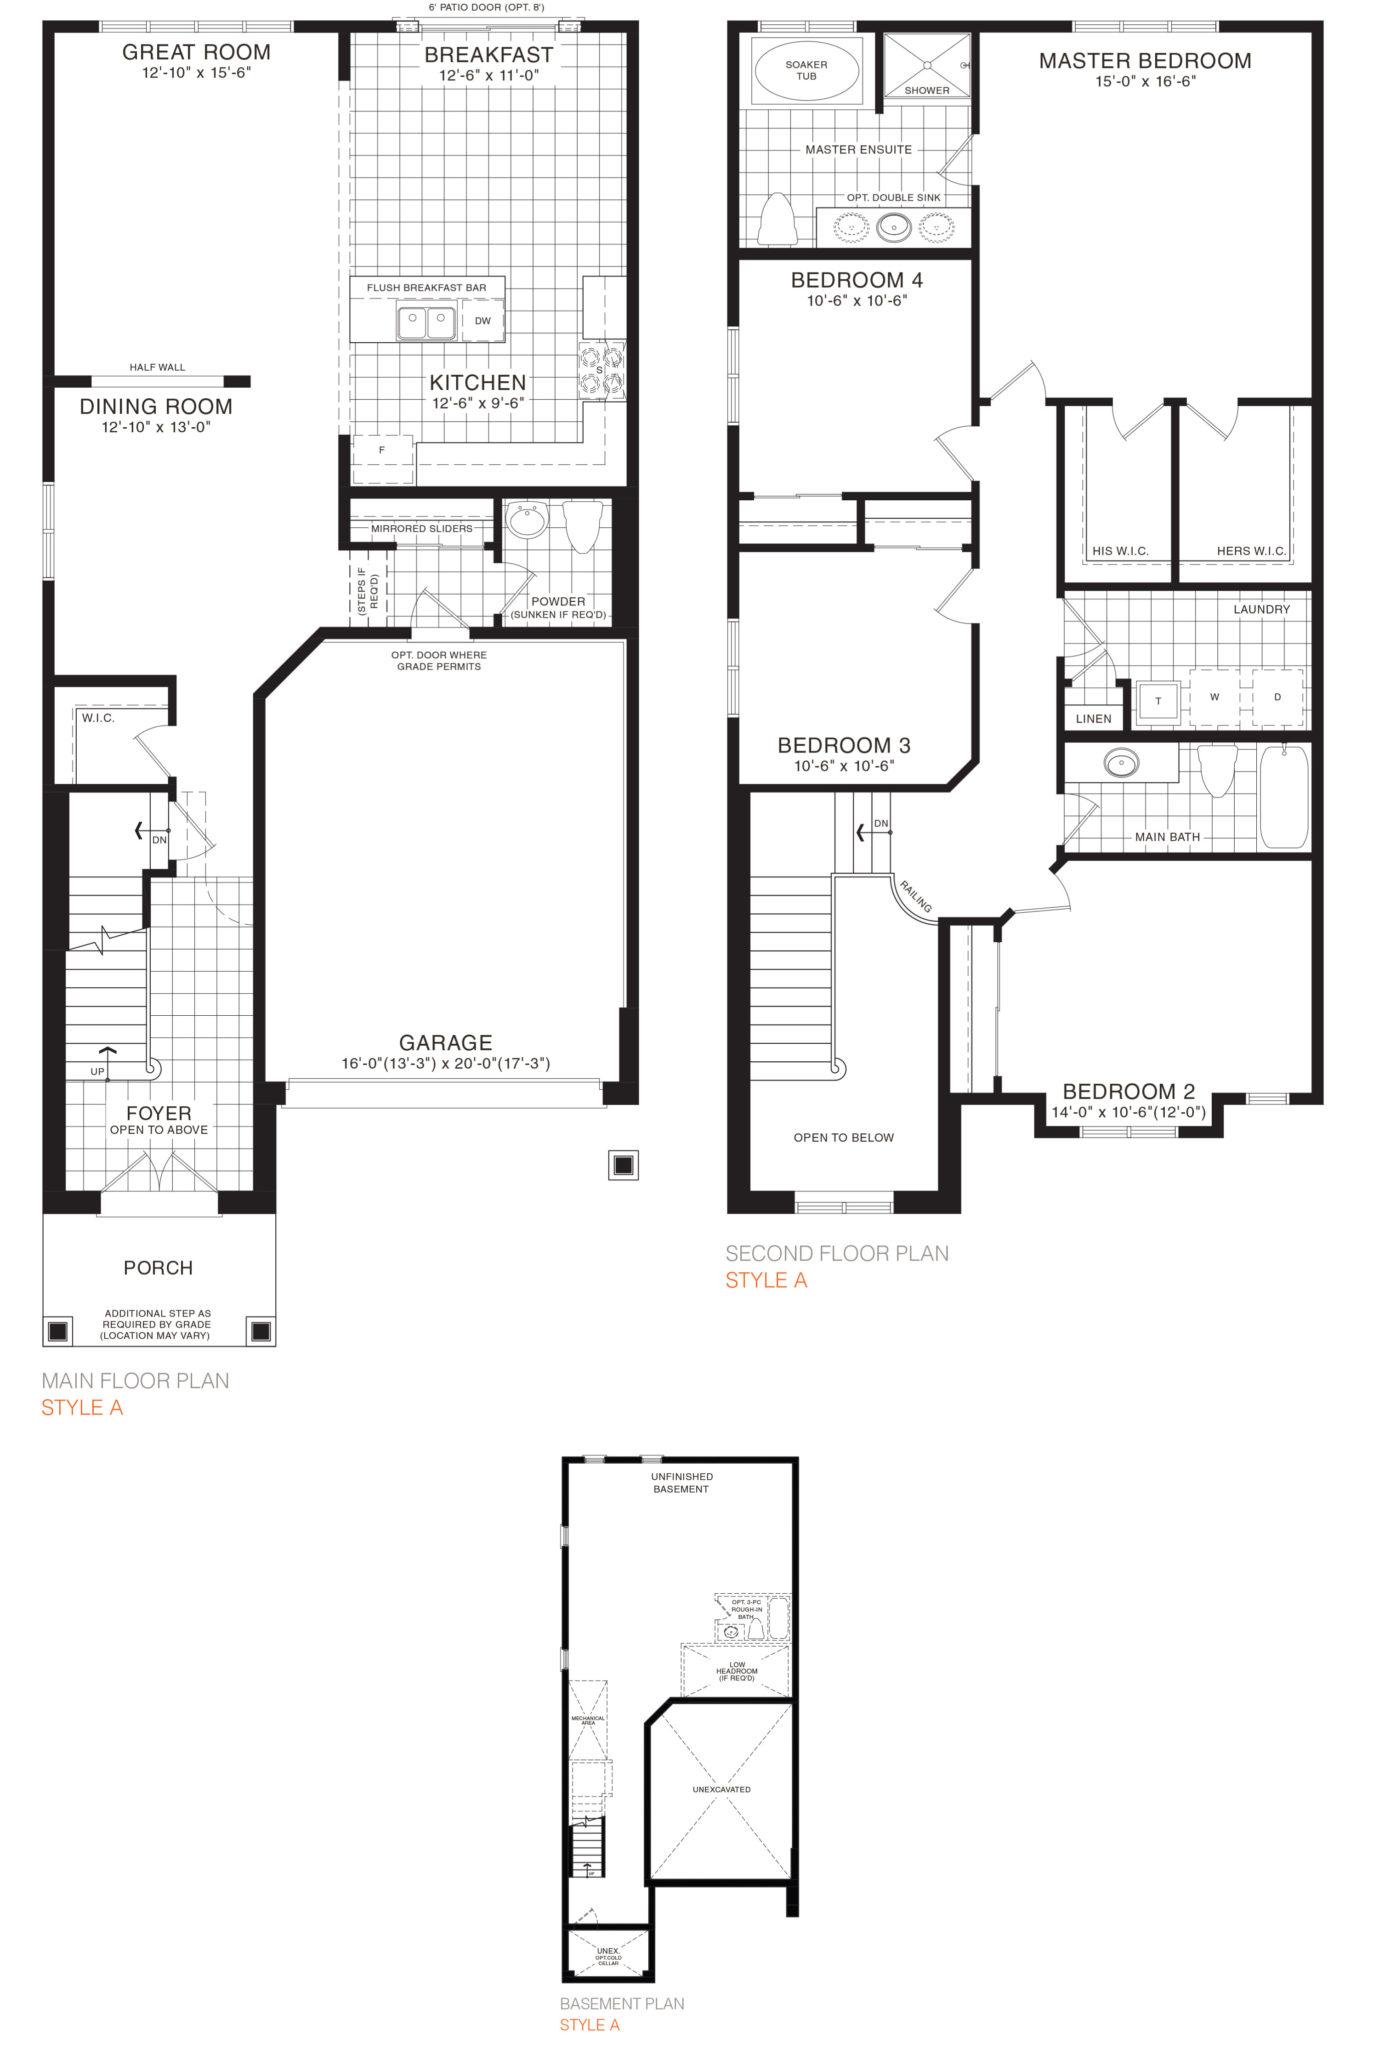 22536-rosebery-33-floor-plan-updated-2020-05-27